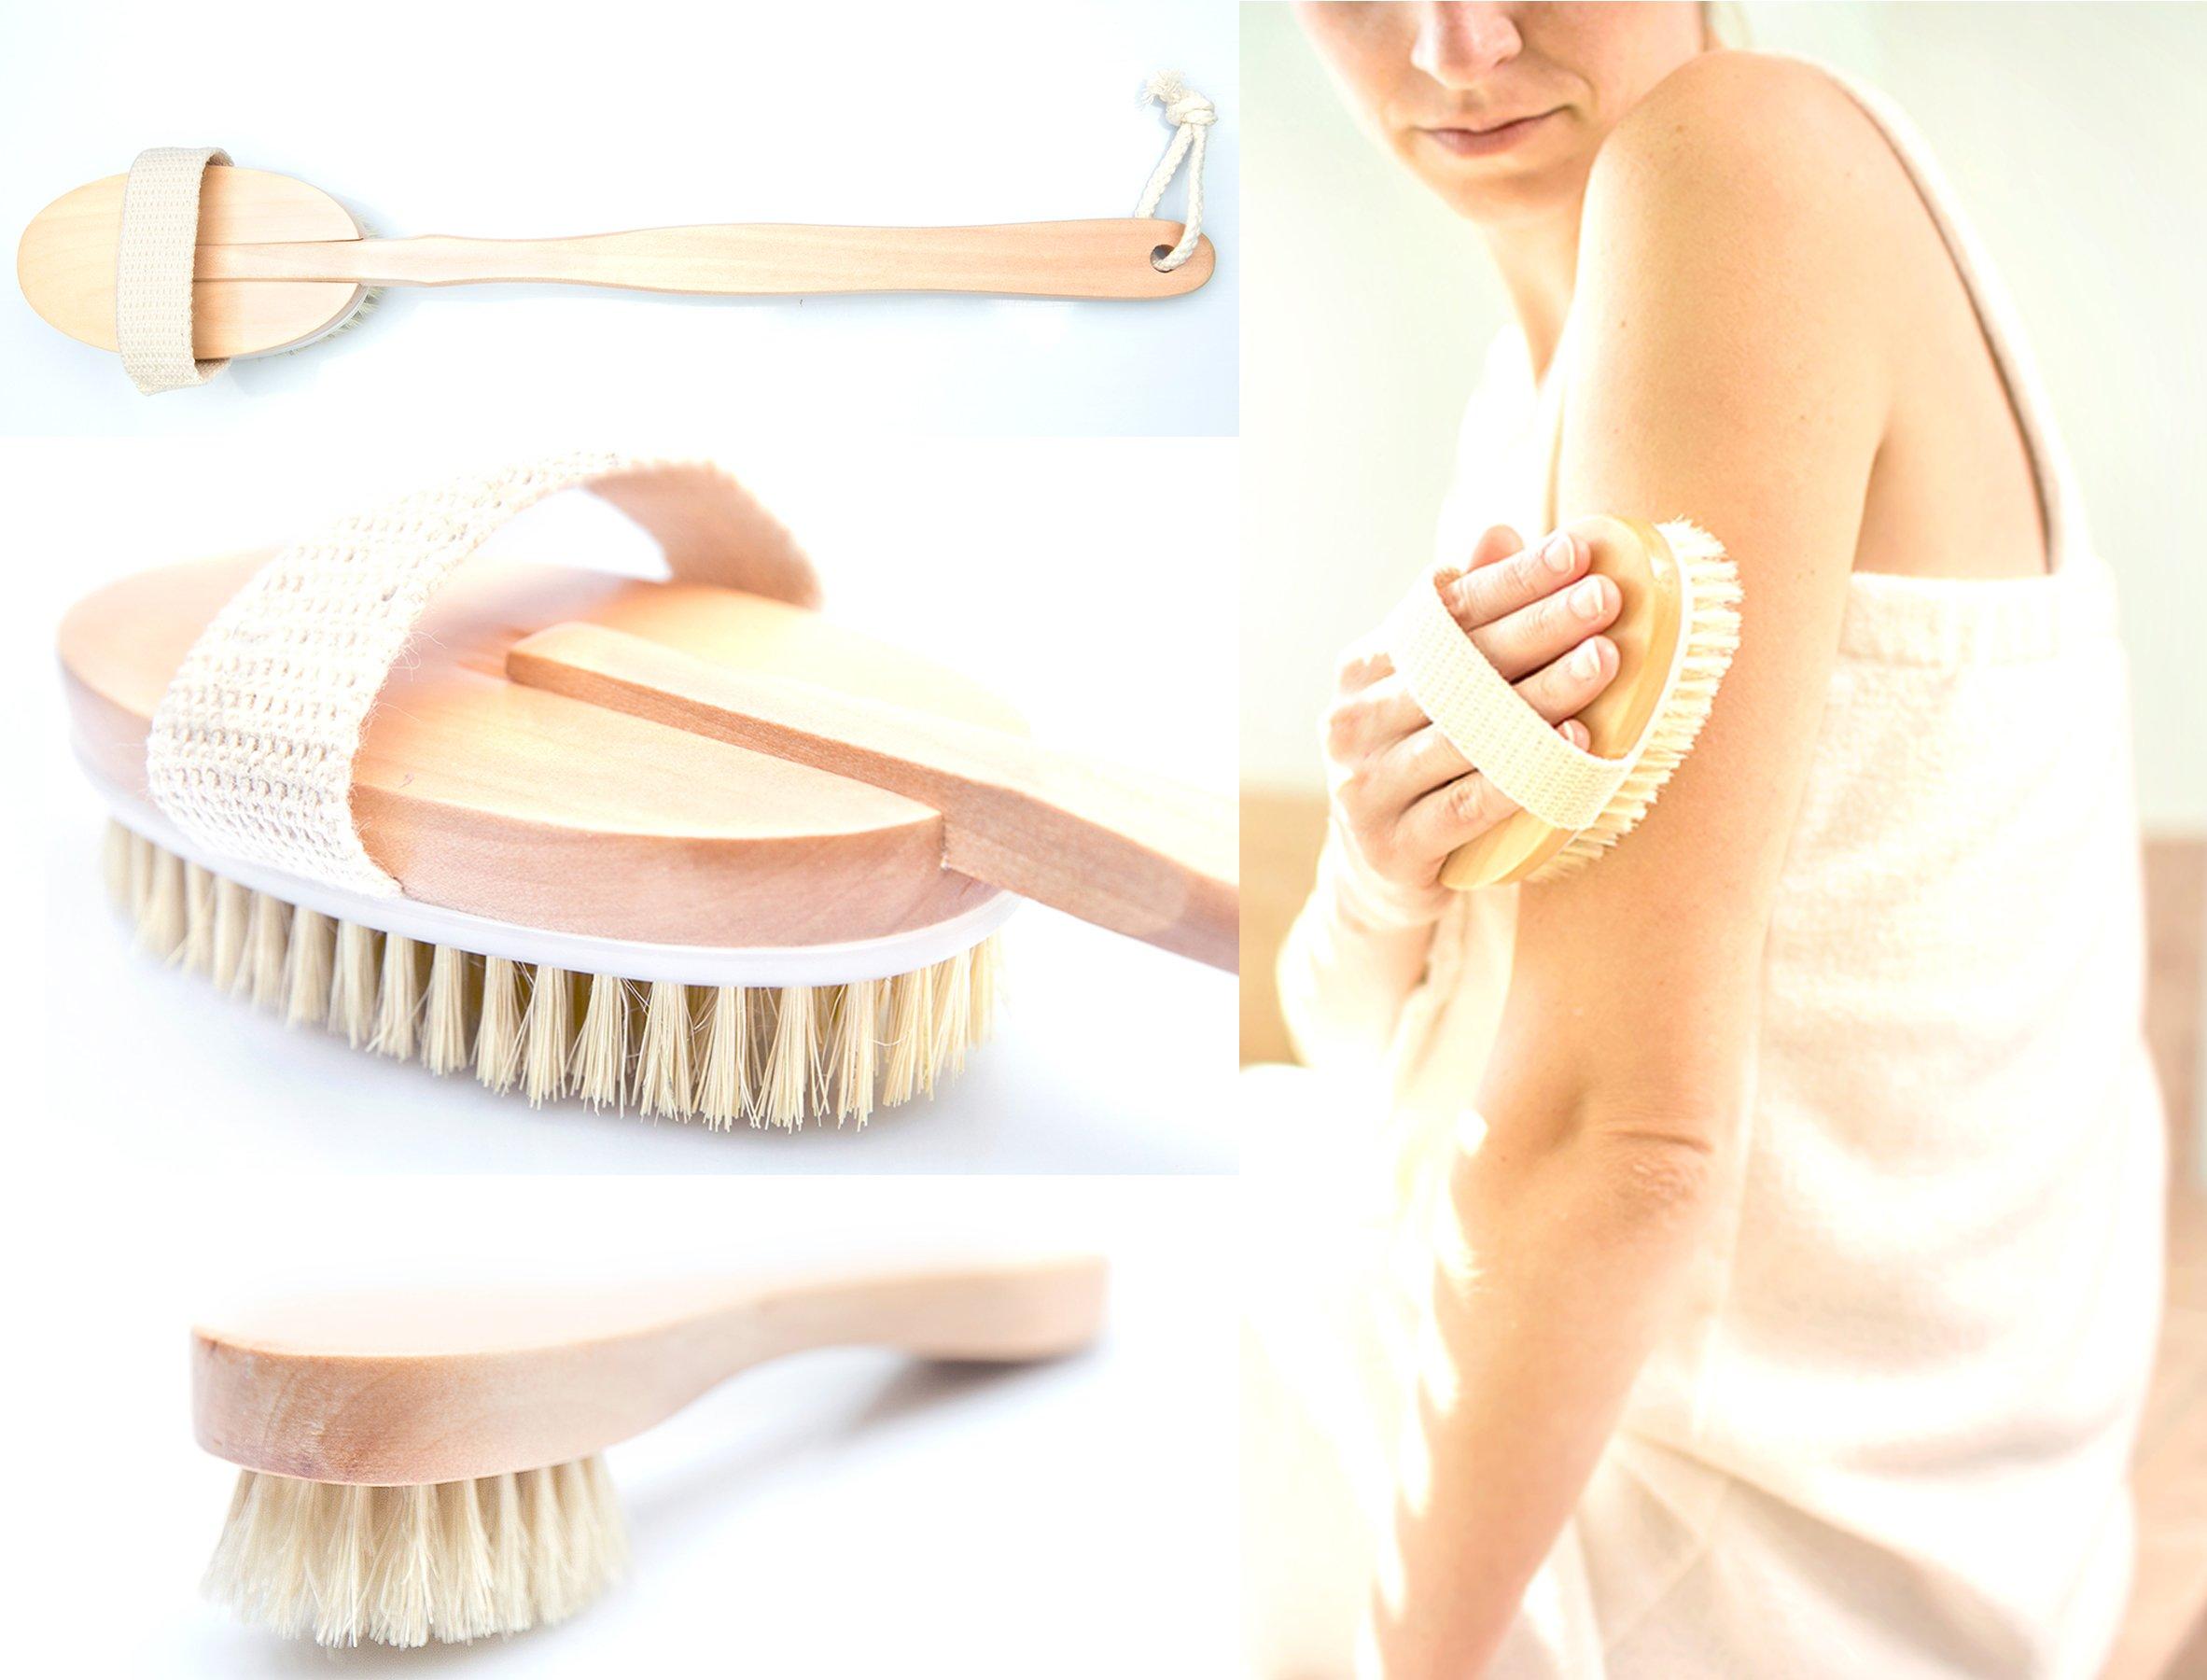 3 Piece Dry Brush Set for Cellulite Massaging, Dry Body Brushing